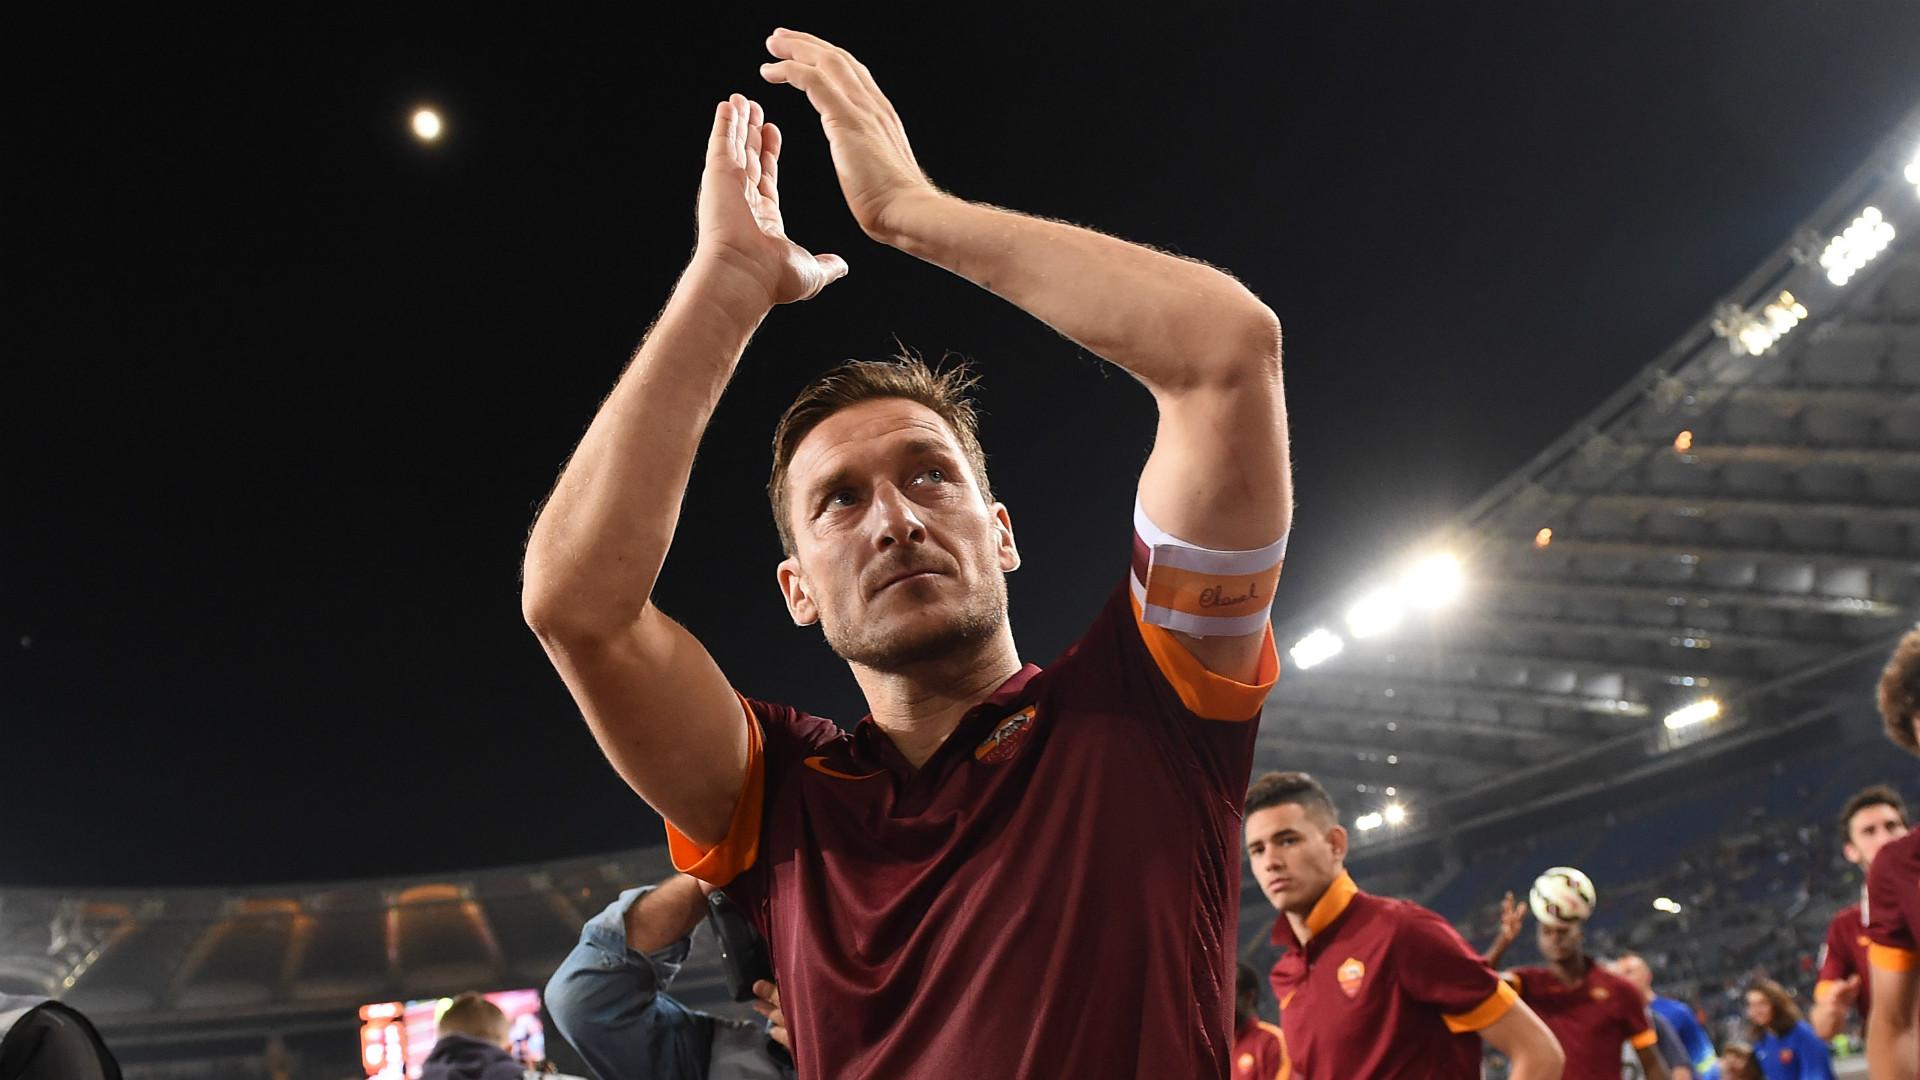 Twenty-five seasons, 307 goals, one incredible legacy – the numbers behind Totti's remarkable career